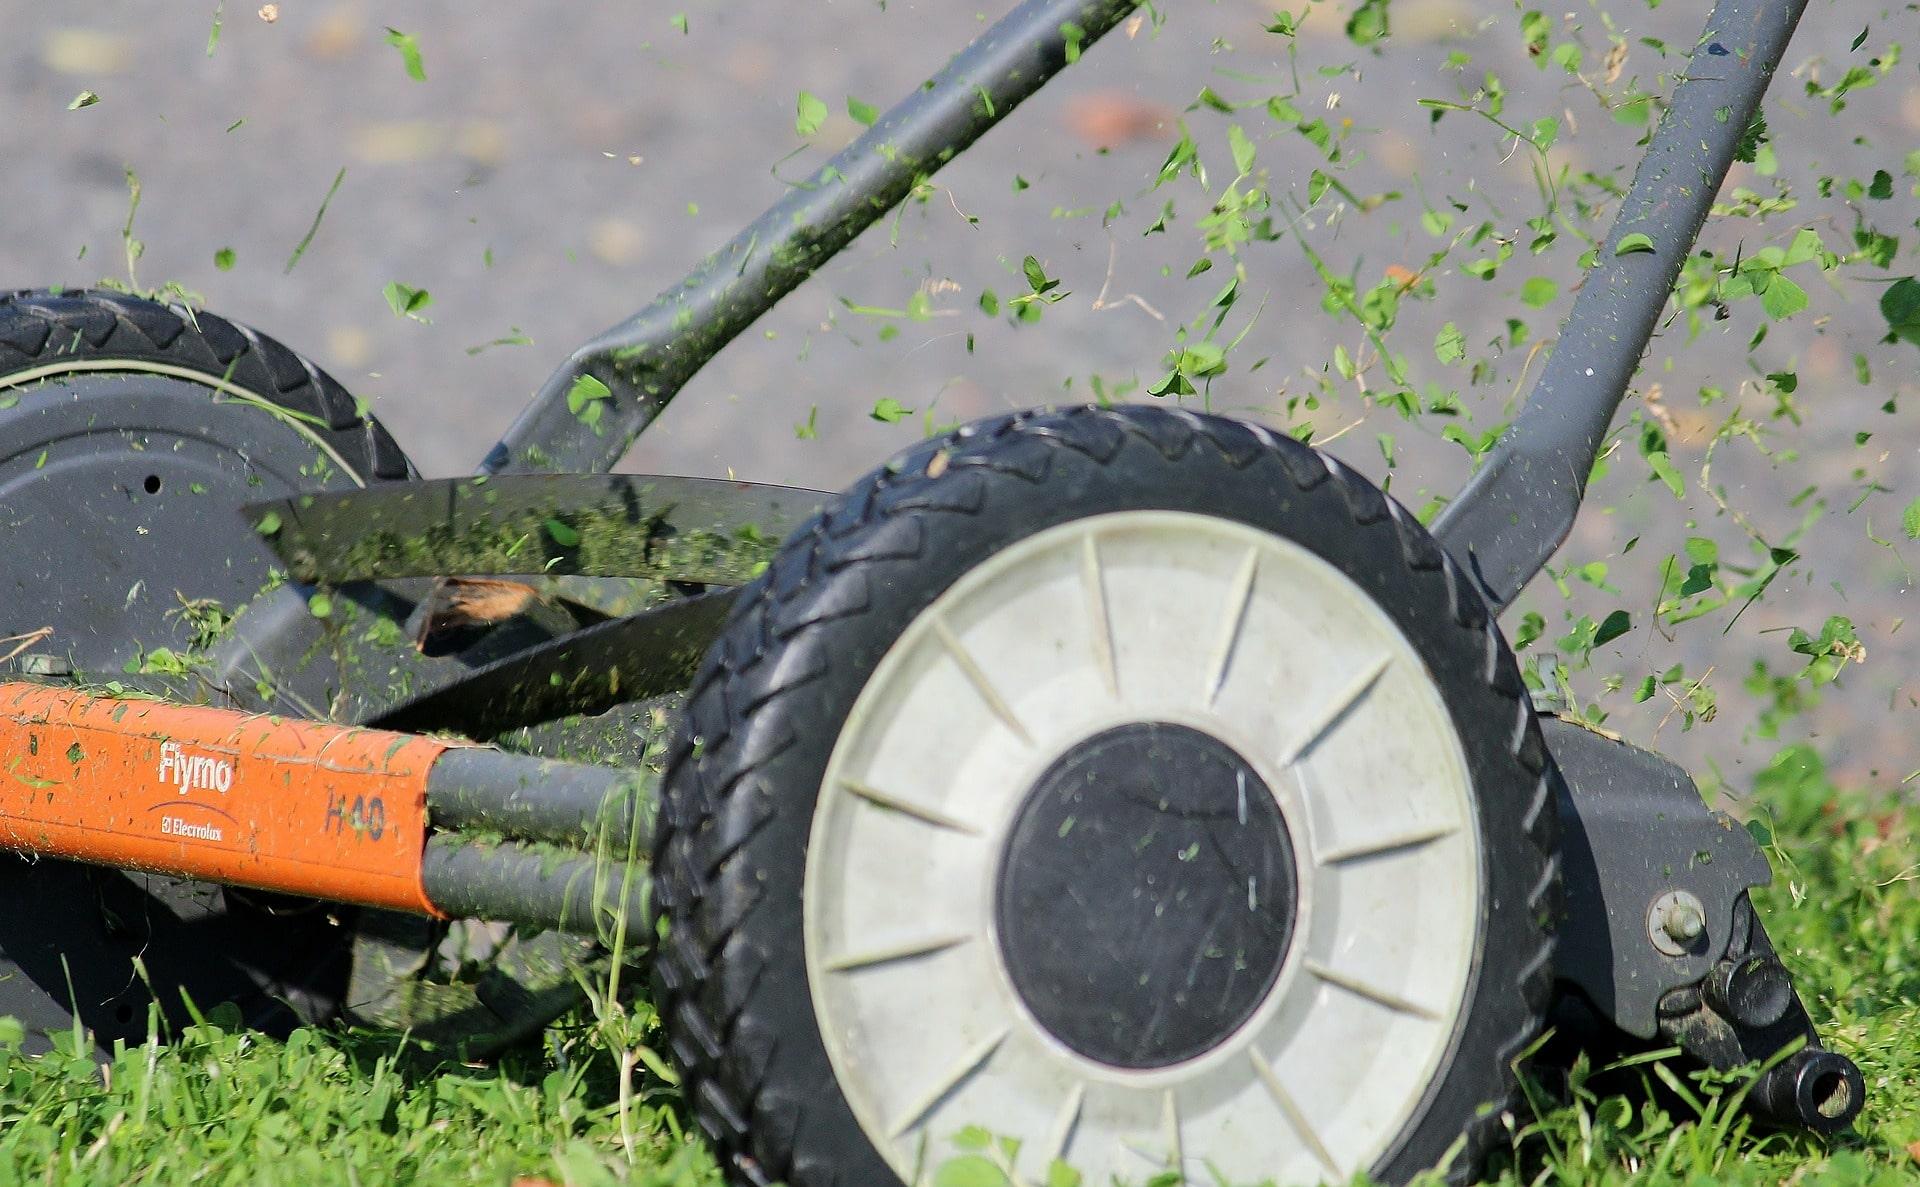 Flymo manual lawn mower.